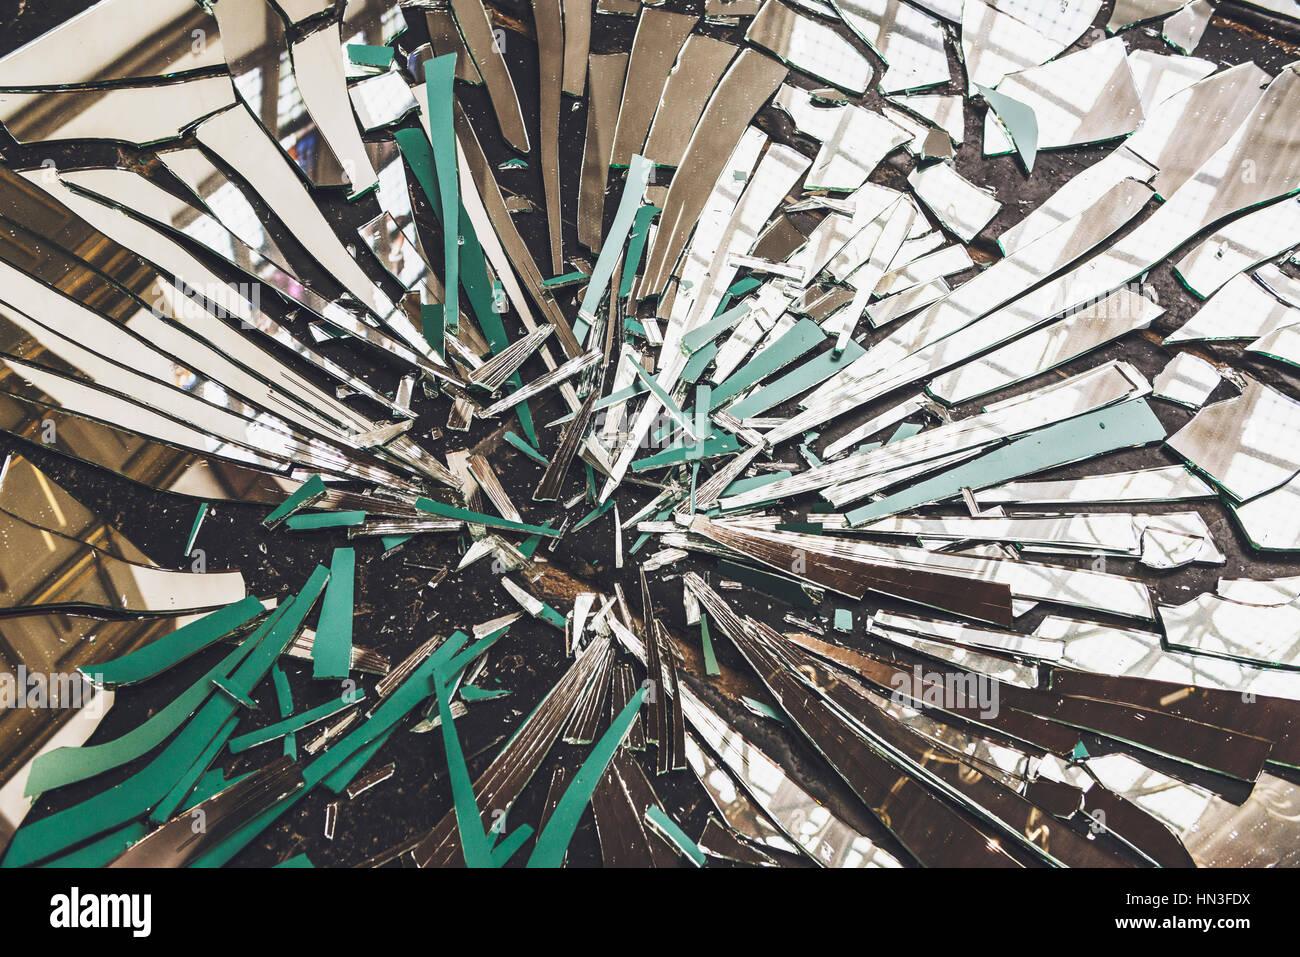 Close Up View Of Broken Mirror On Floor With Window Light